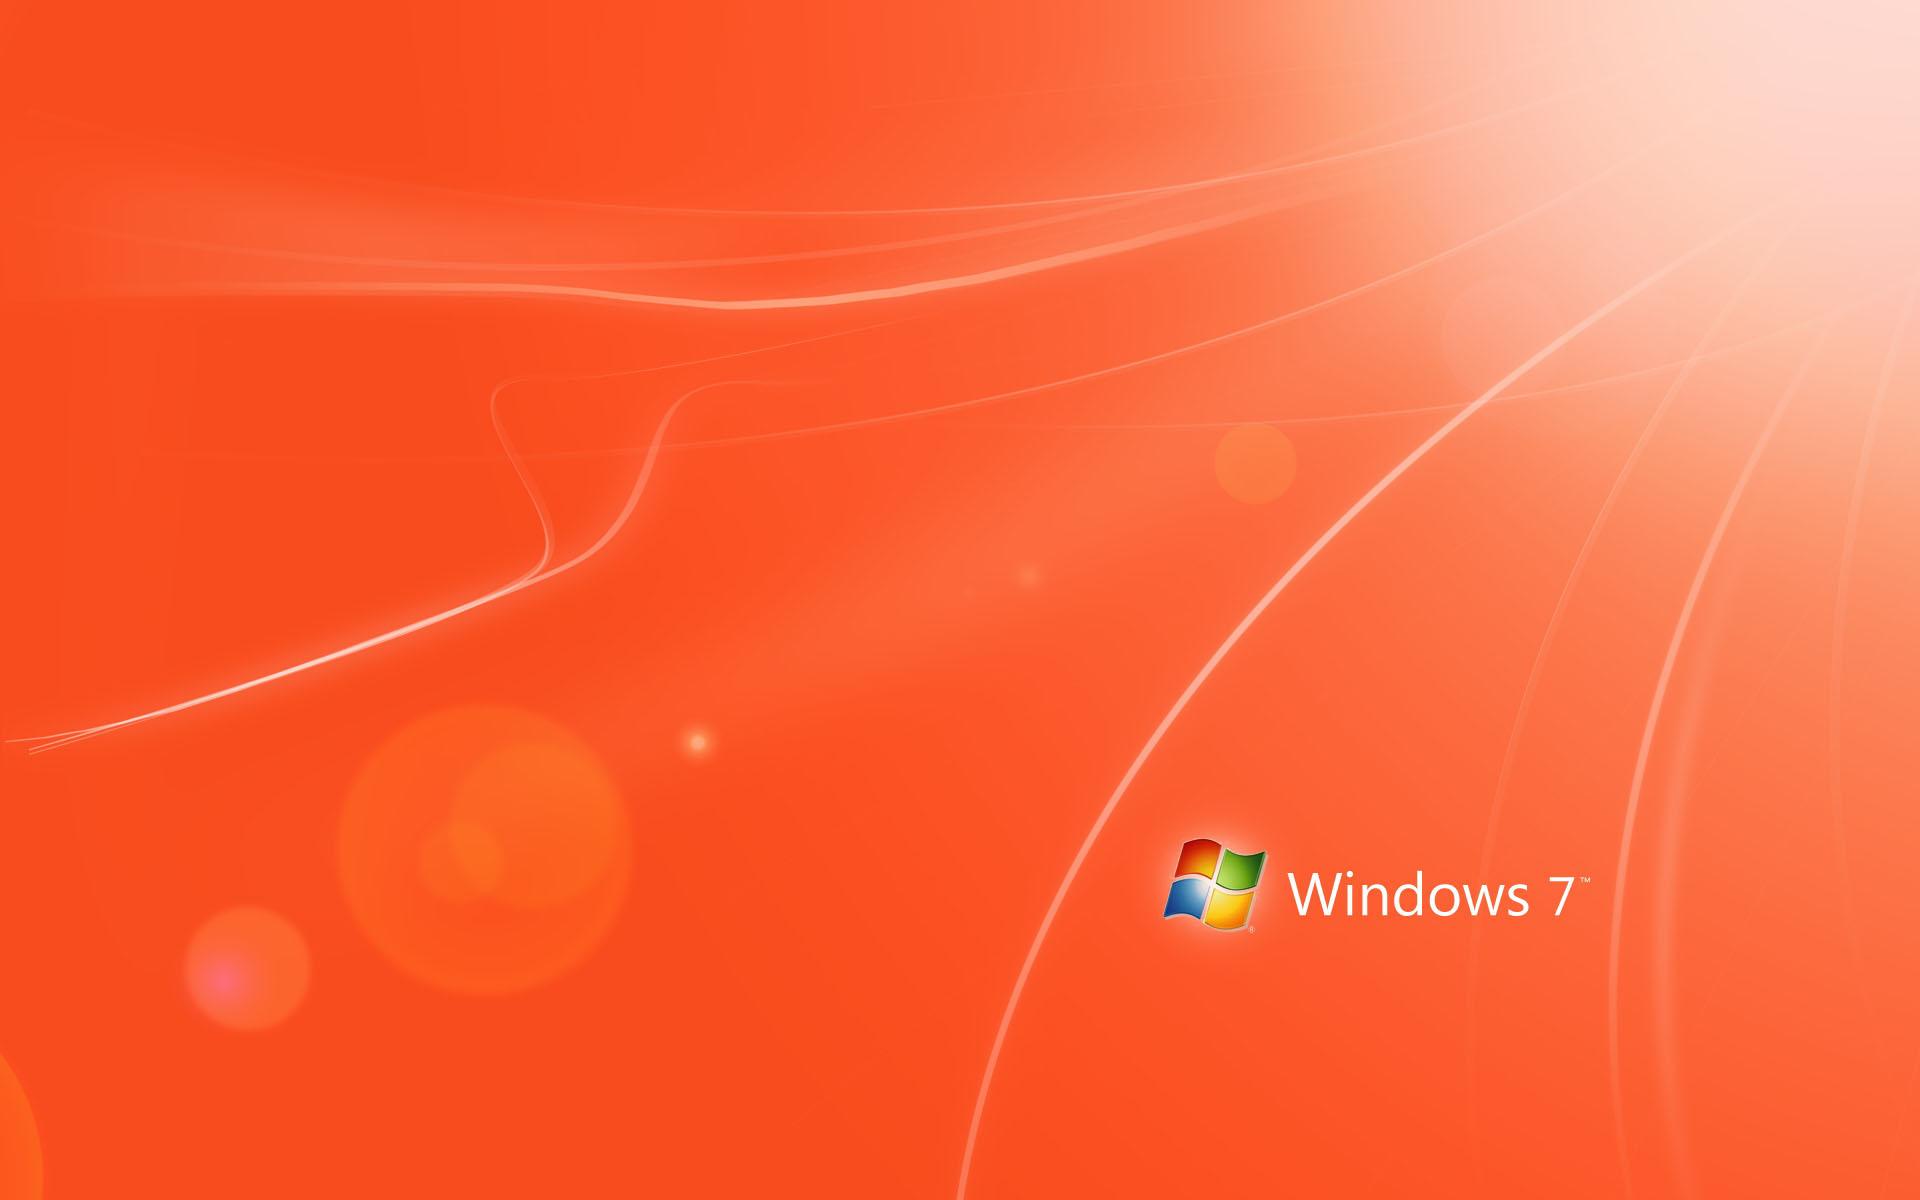 Orange Windows   Red Windows 7 Wallpaper Full Hd 1568395   HD 1920x1200